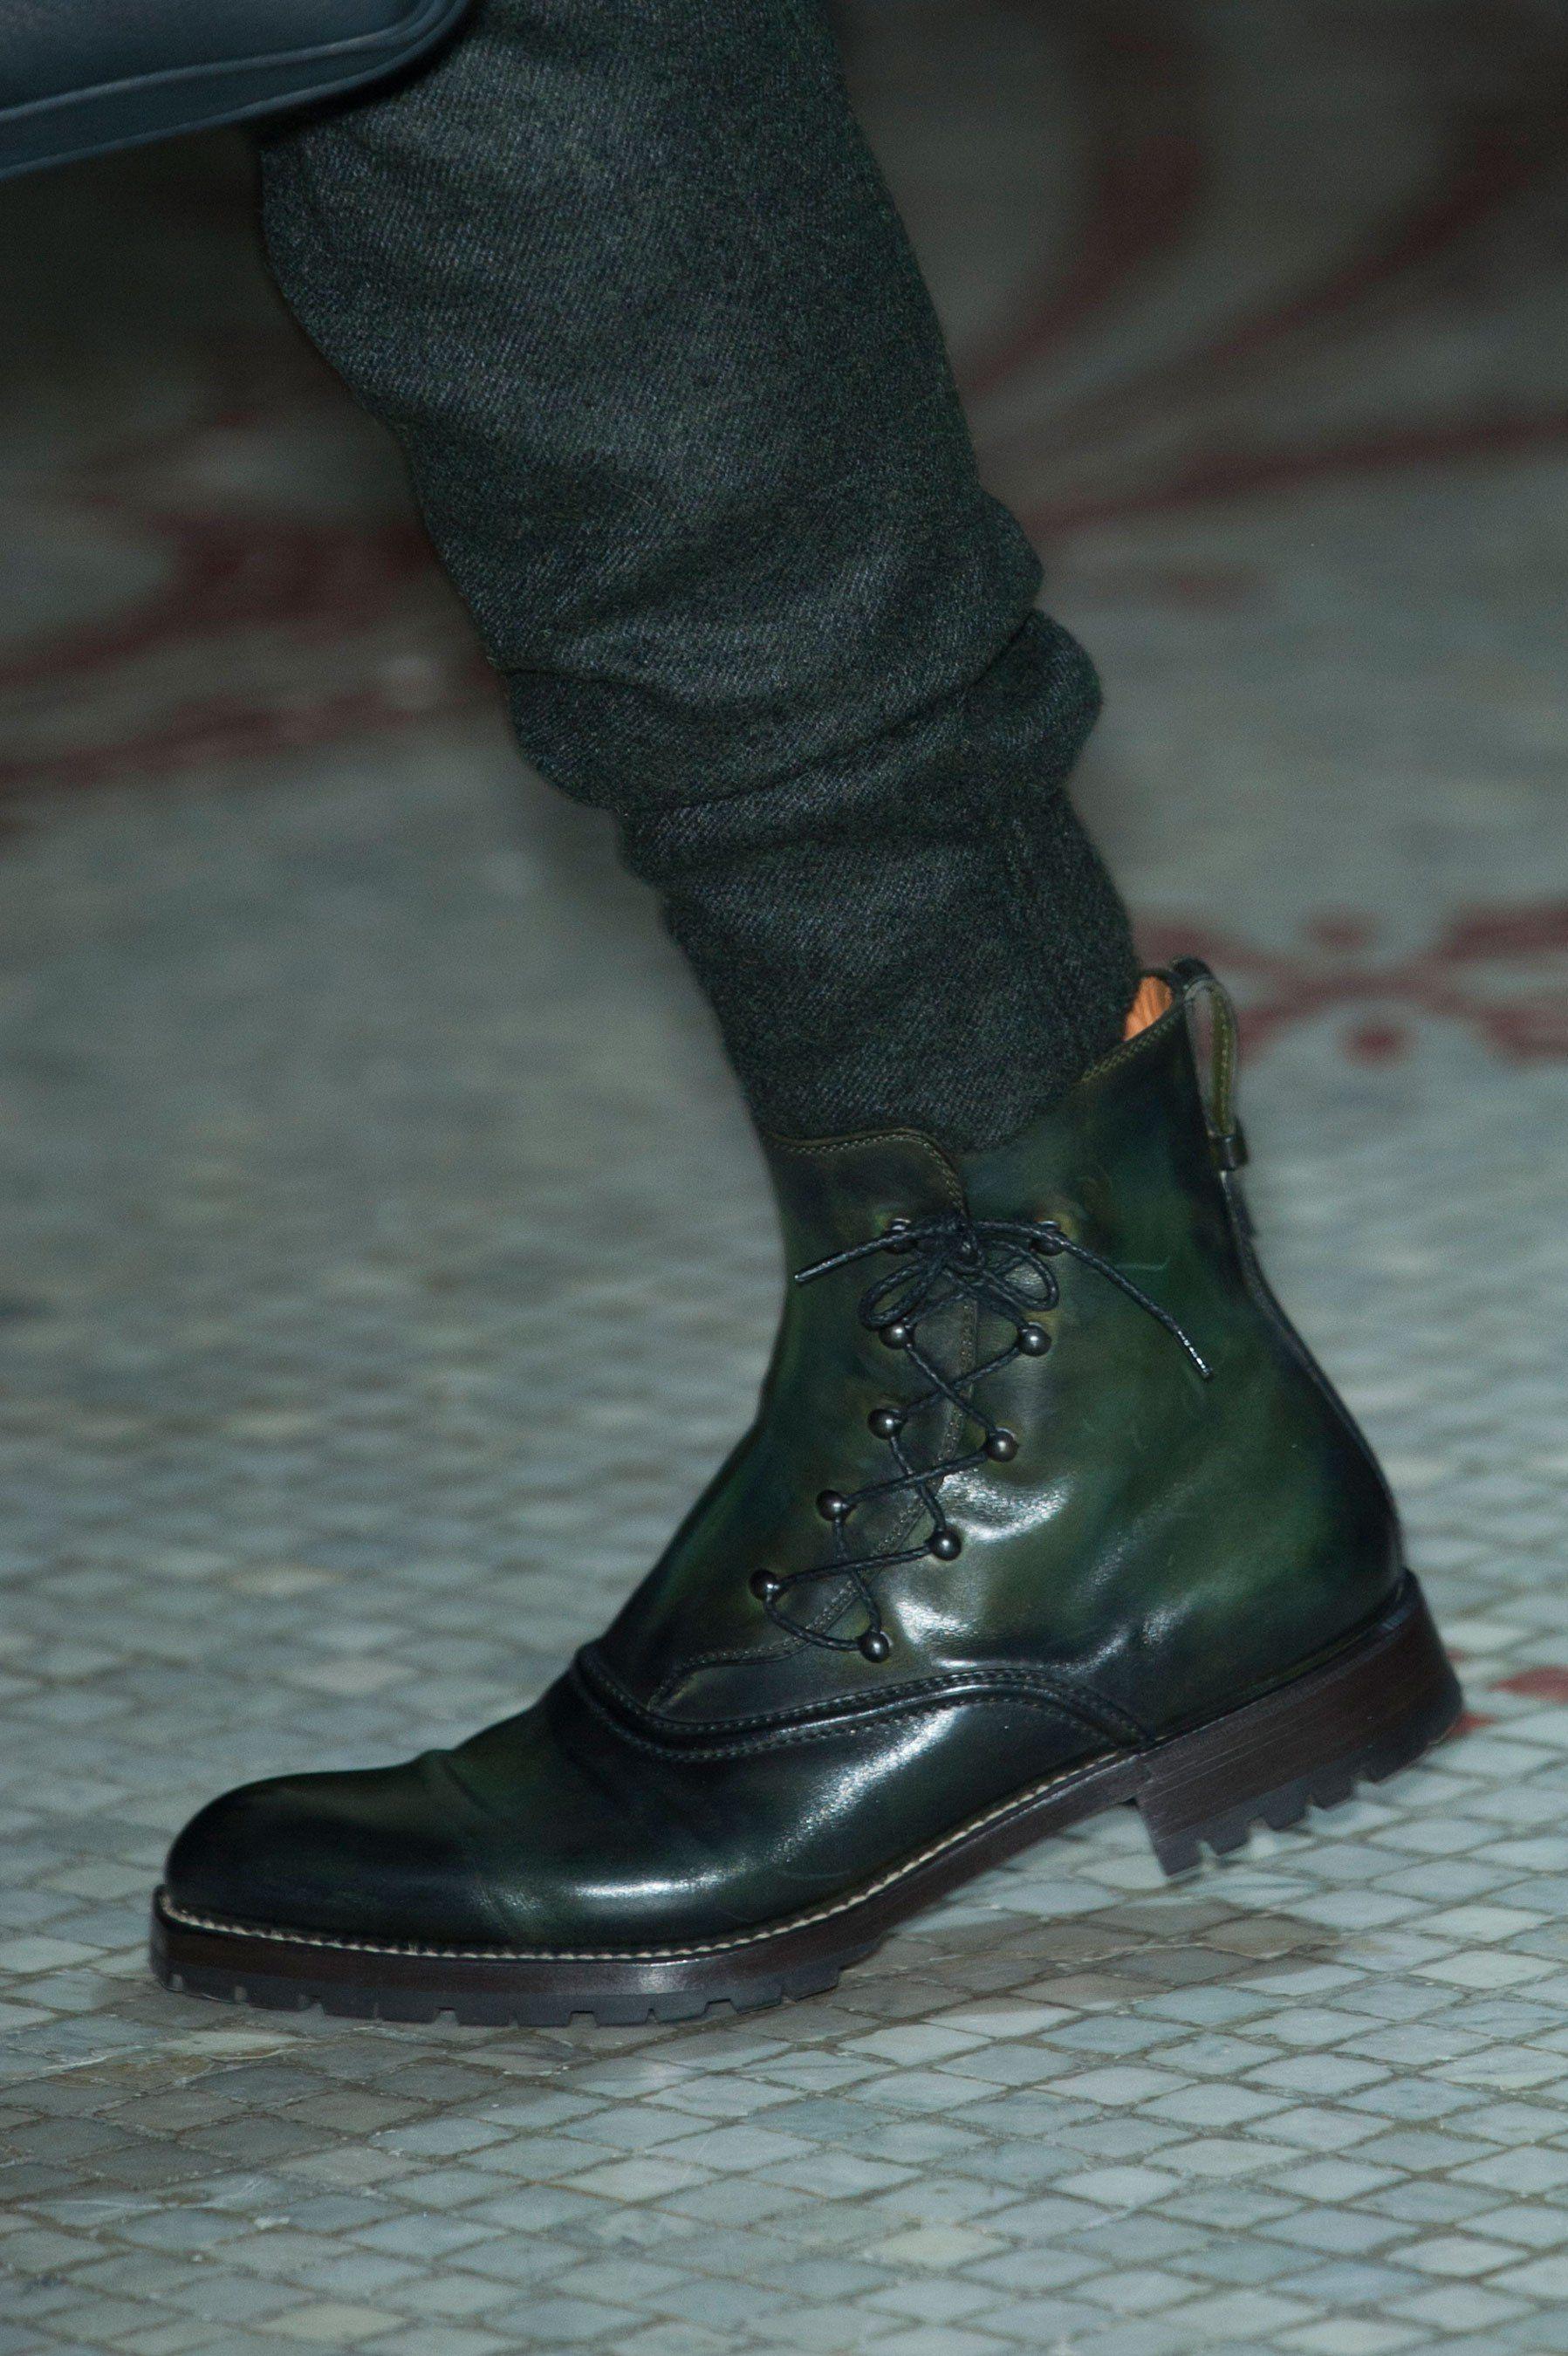 Detailed Photos Of Berluti Autumn Fall Winter 2015 Men S Shoe Boots Dress Shoes Men Mens Boots Fashion